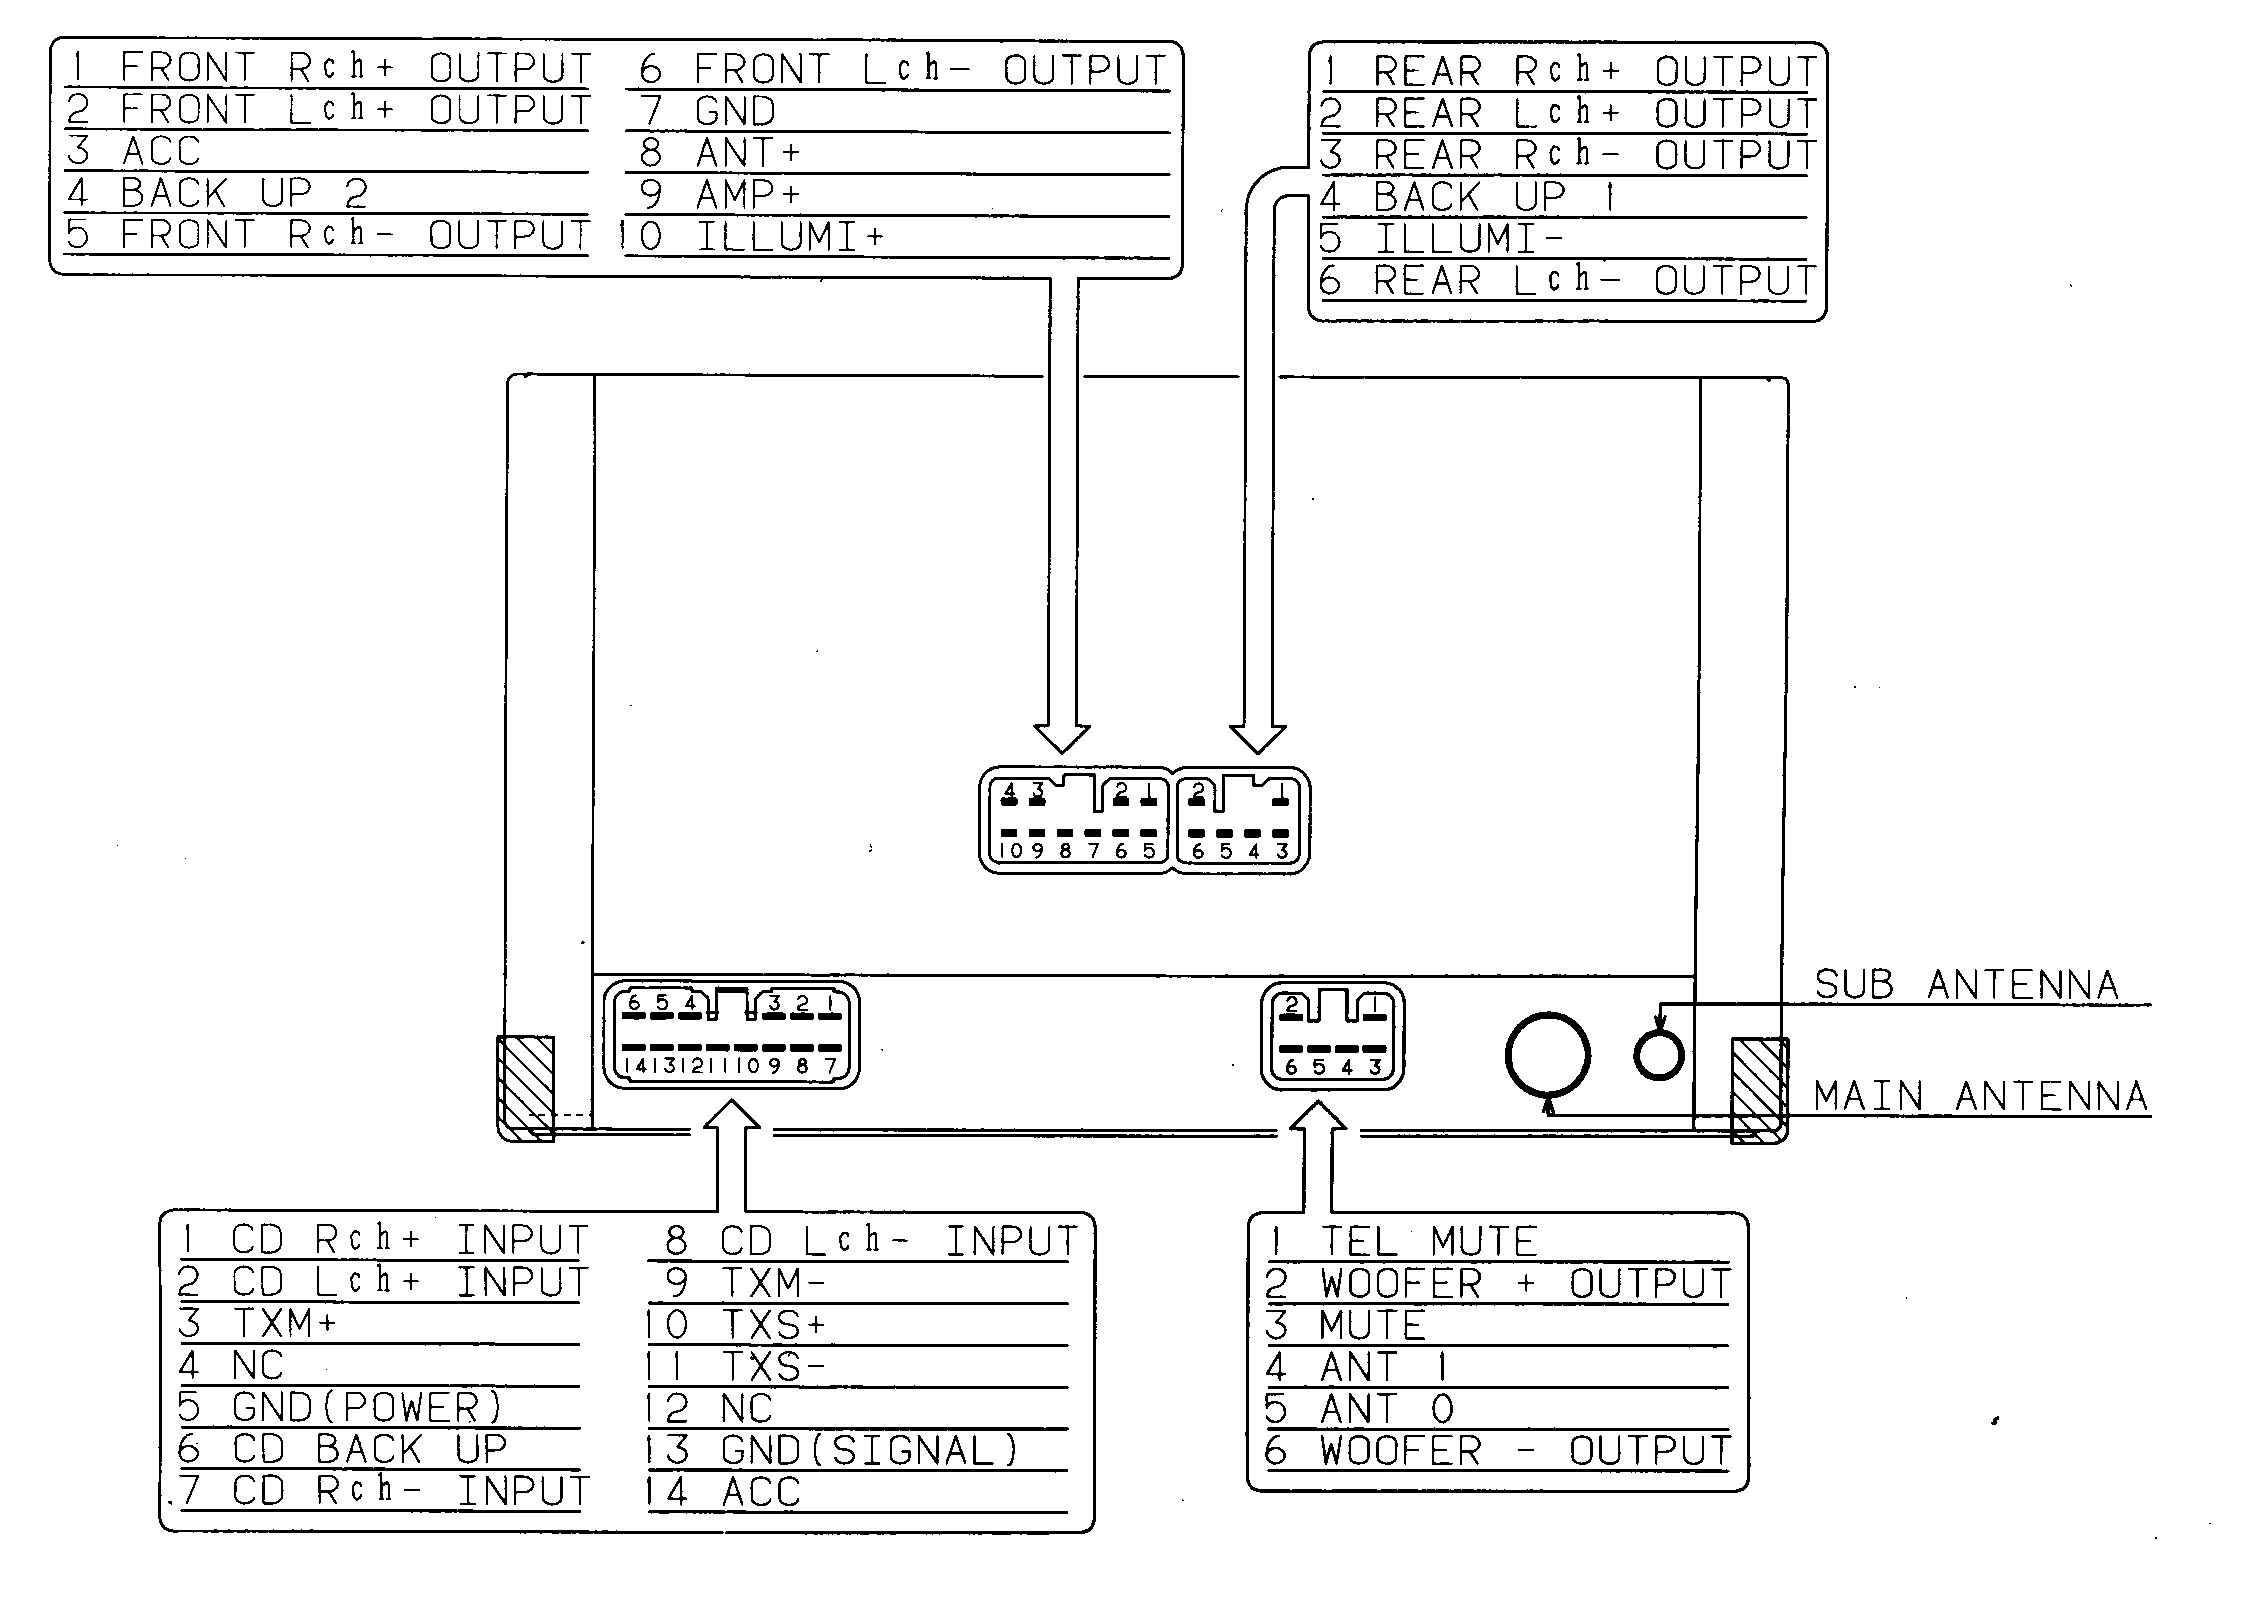 Sony Cdx Gt630ui Wiring Diagram Xplod Car Stereo Gt200 52wx4 Gt Ui On